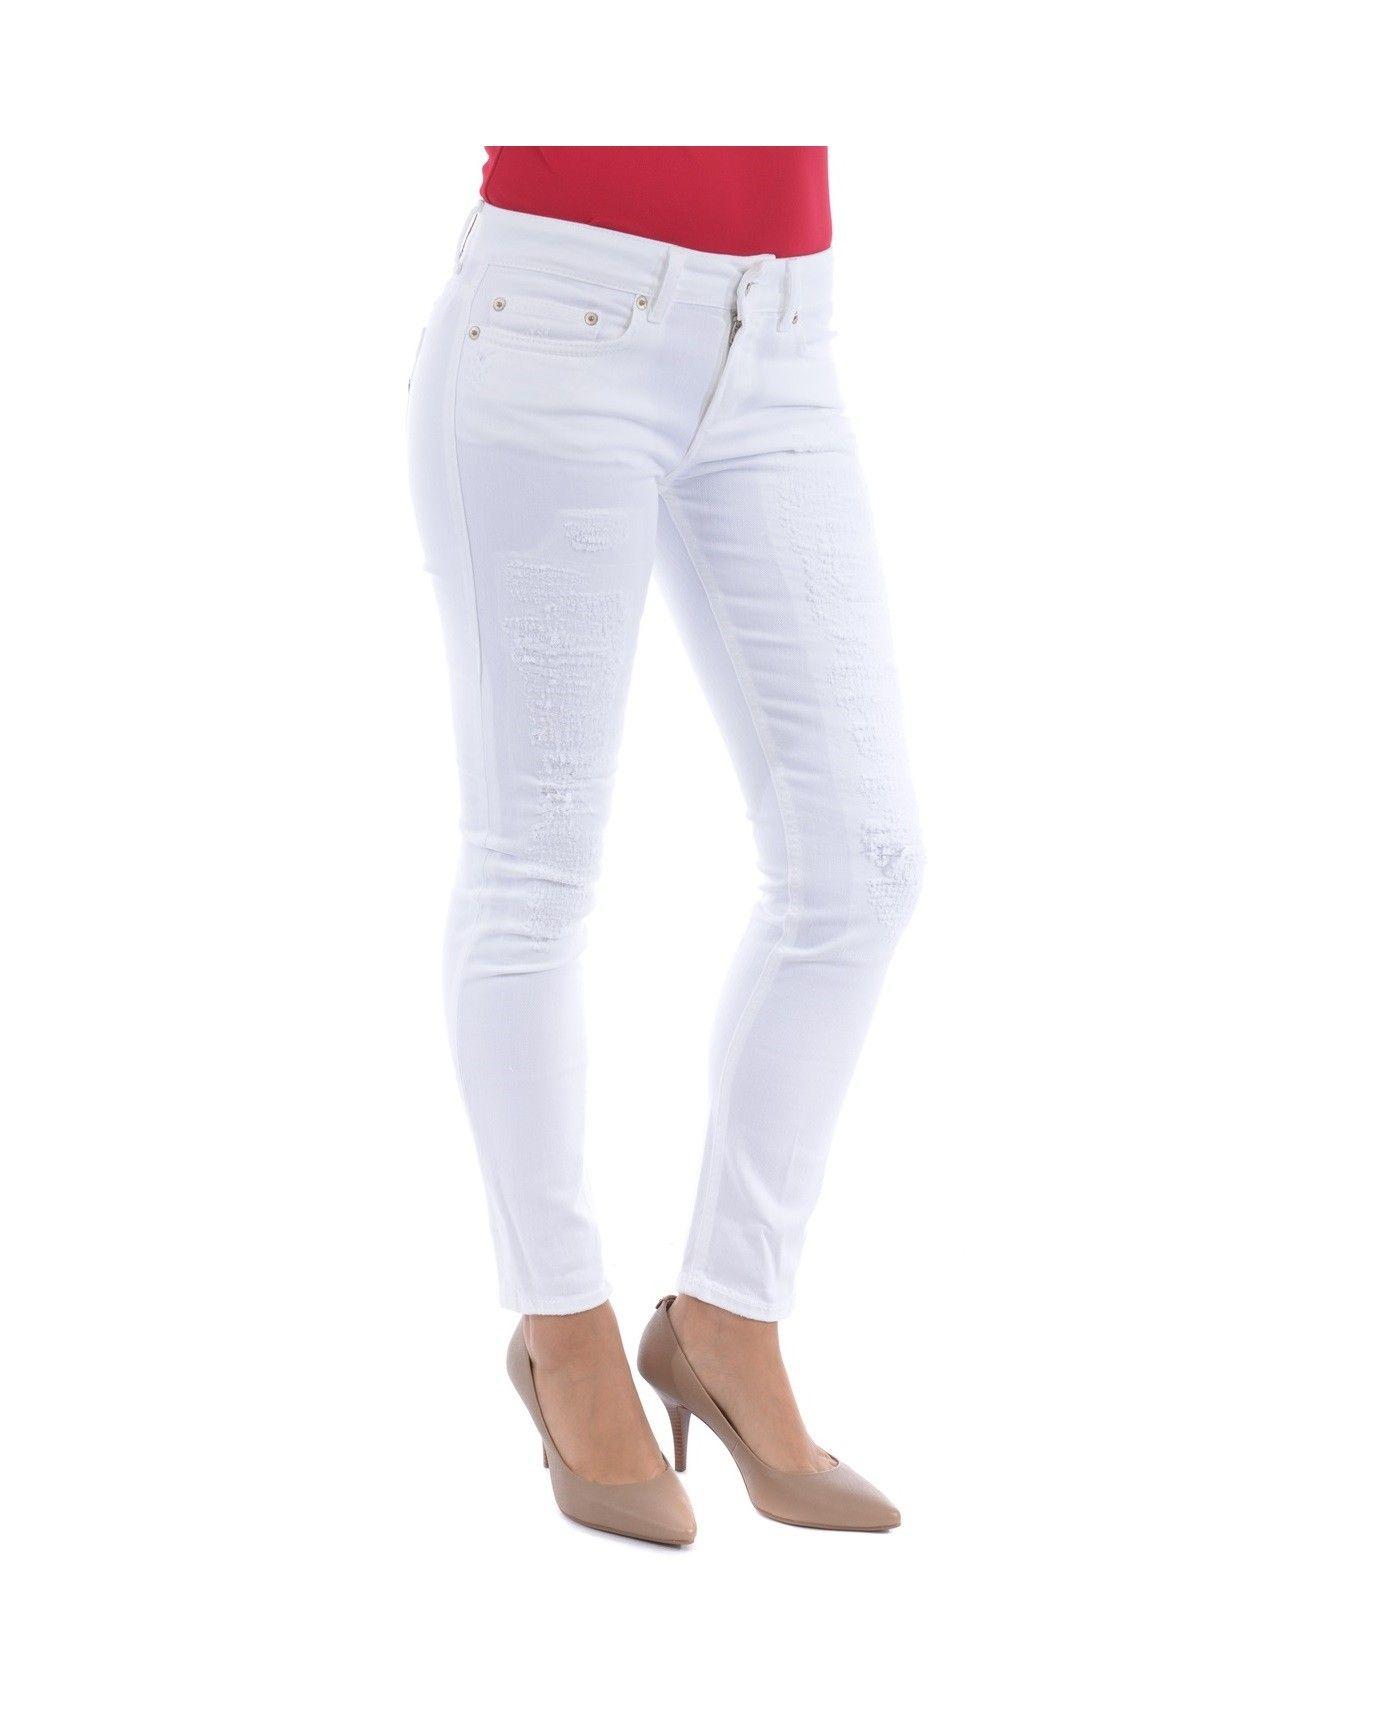 Jeans Dondup donna p692 b5009dv ptd 000 monroe bianco